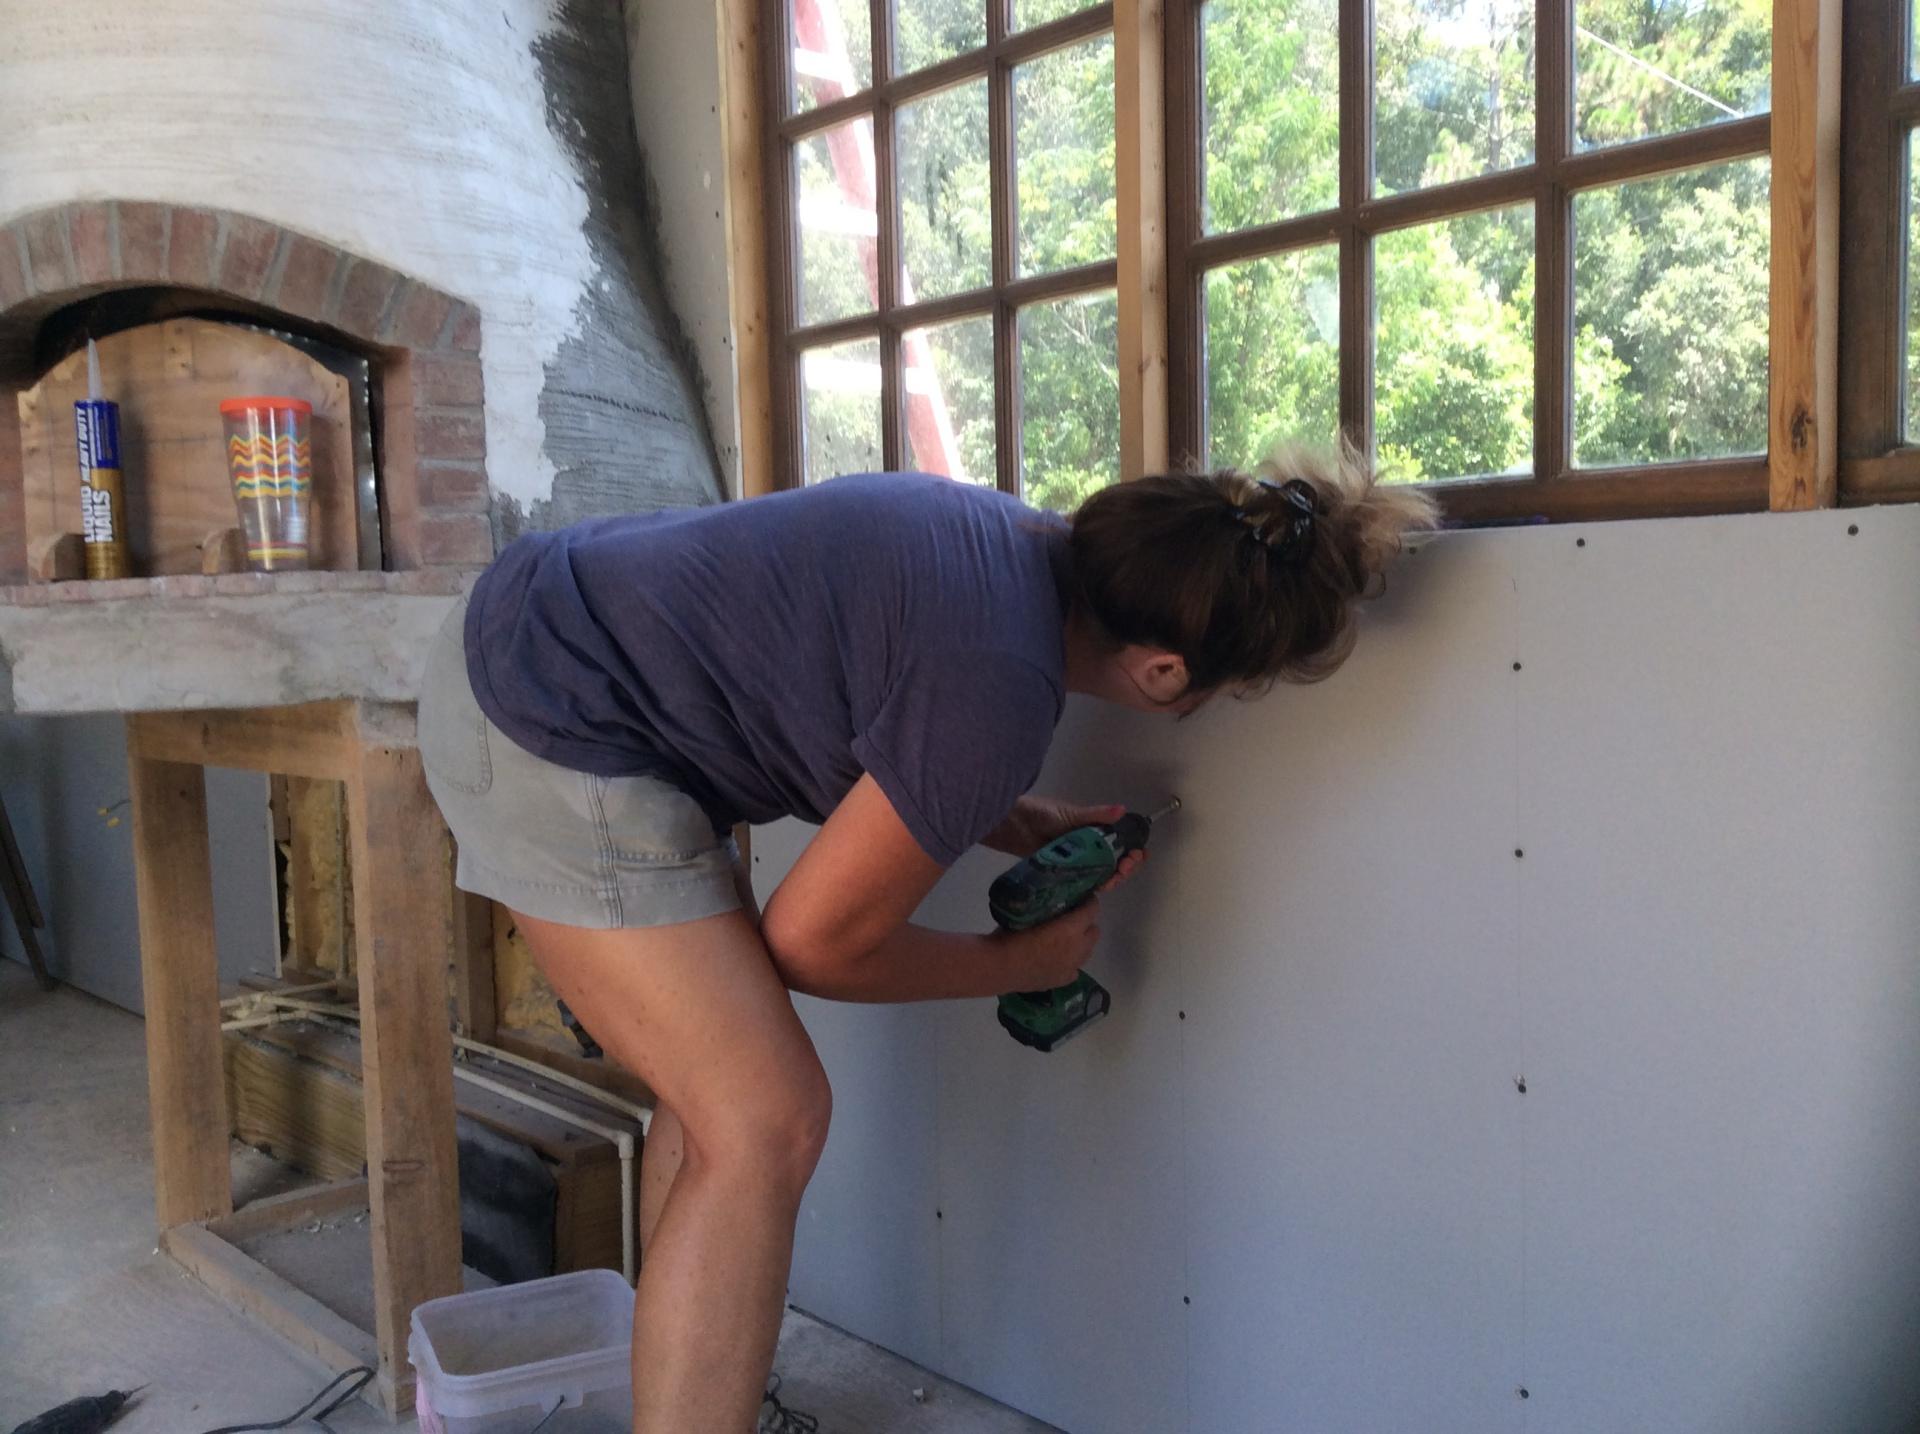 Doing drywall